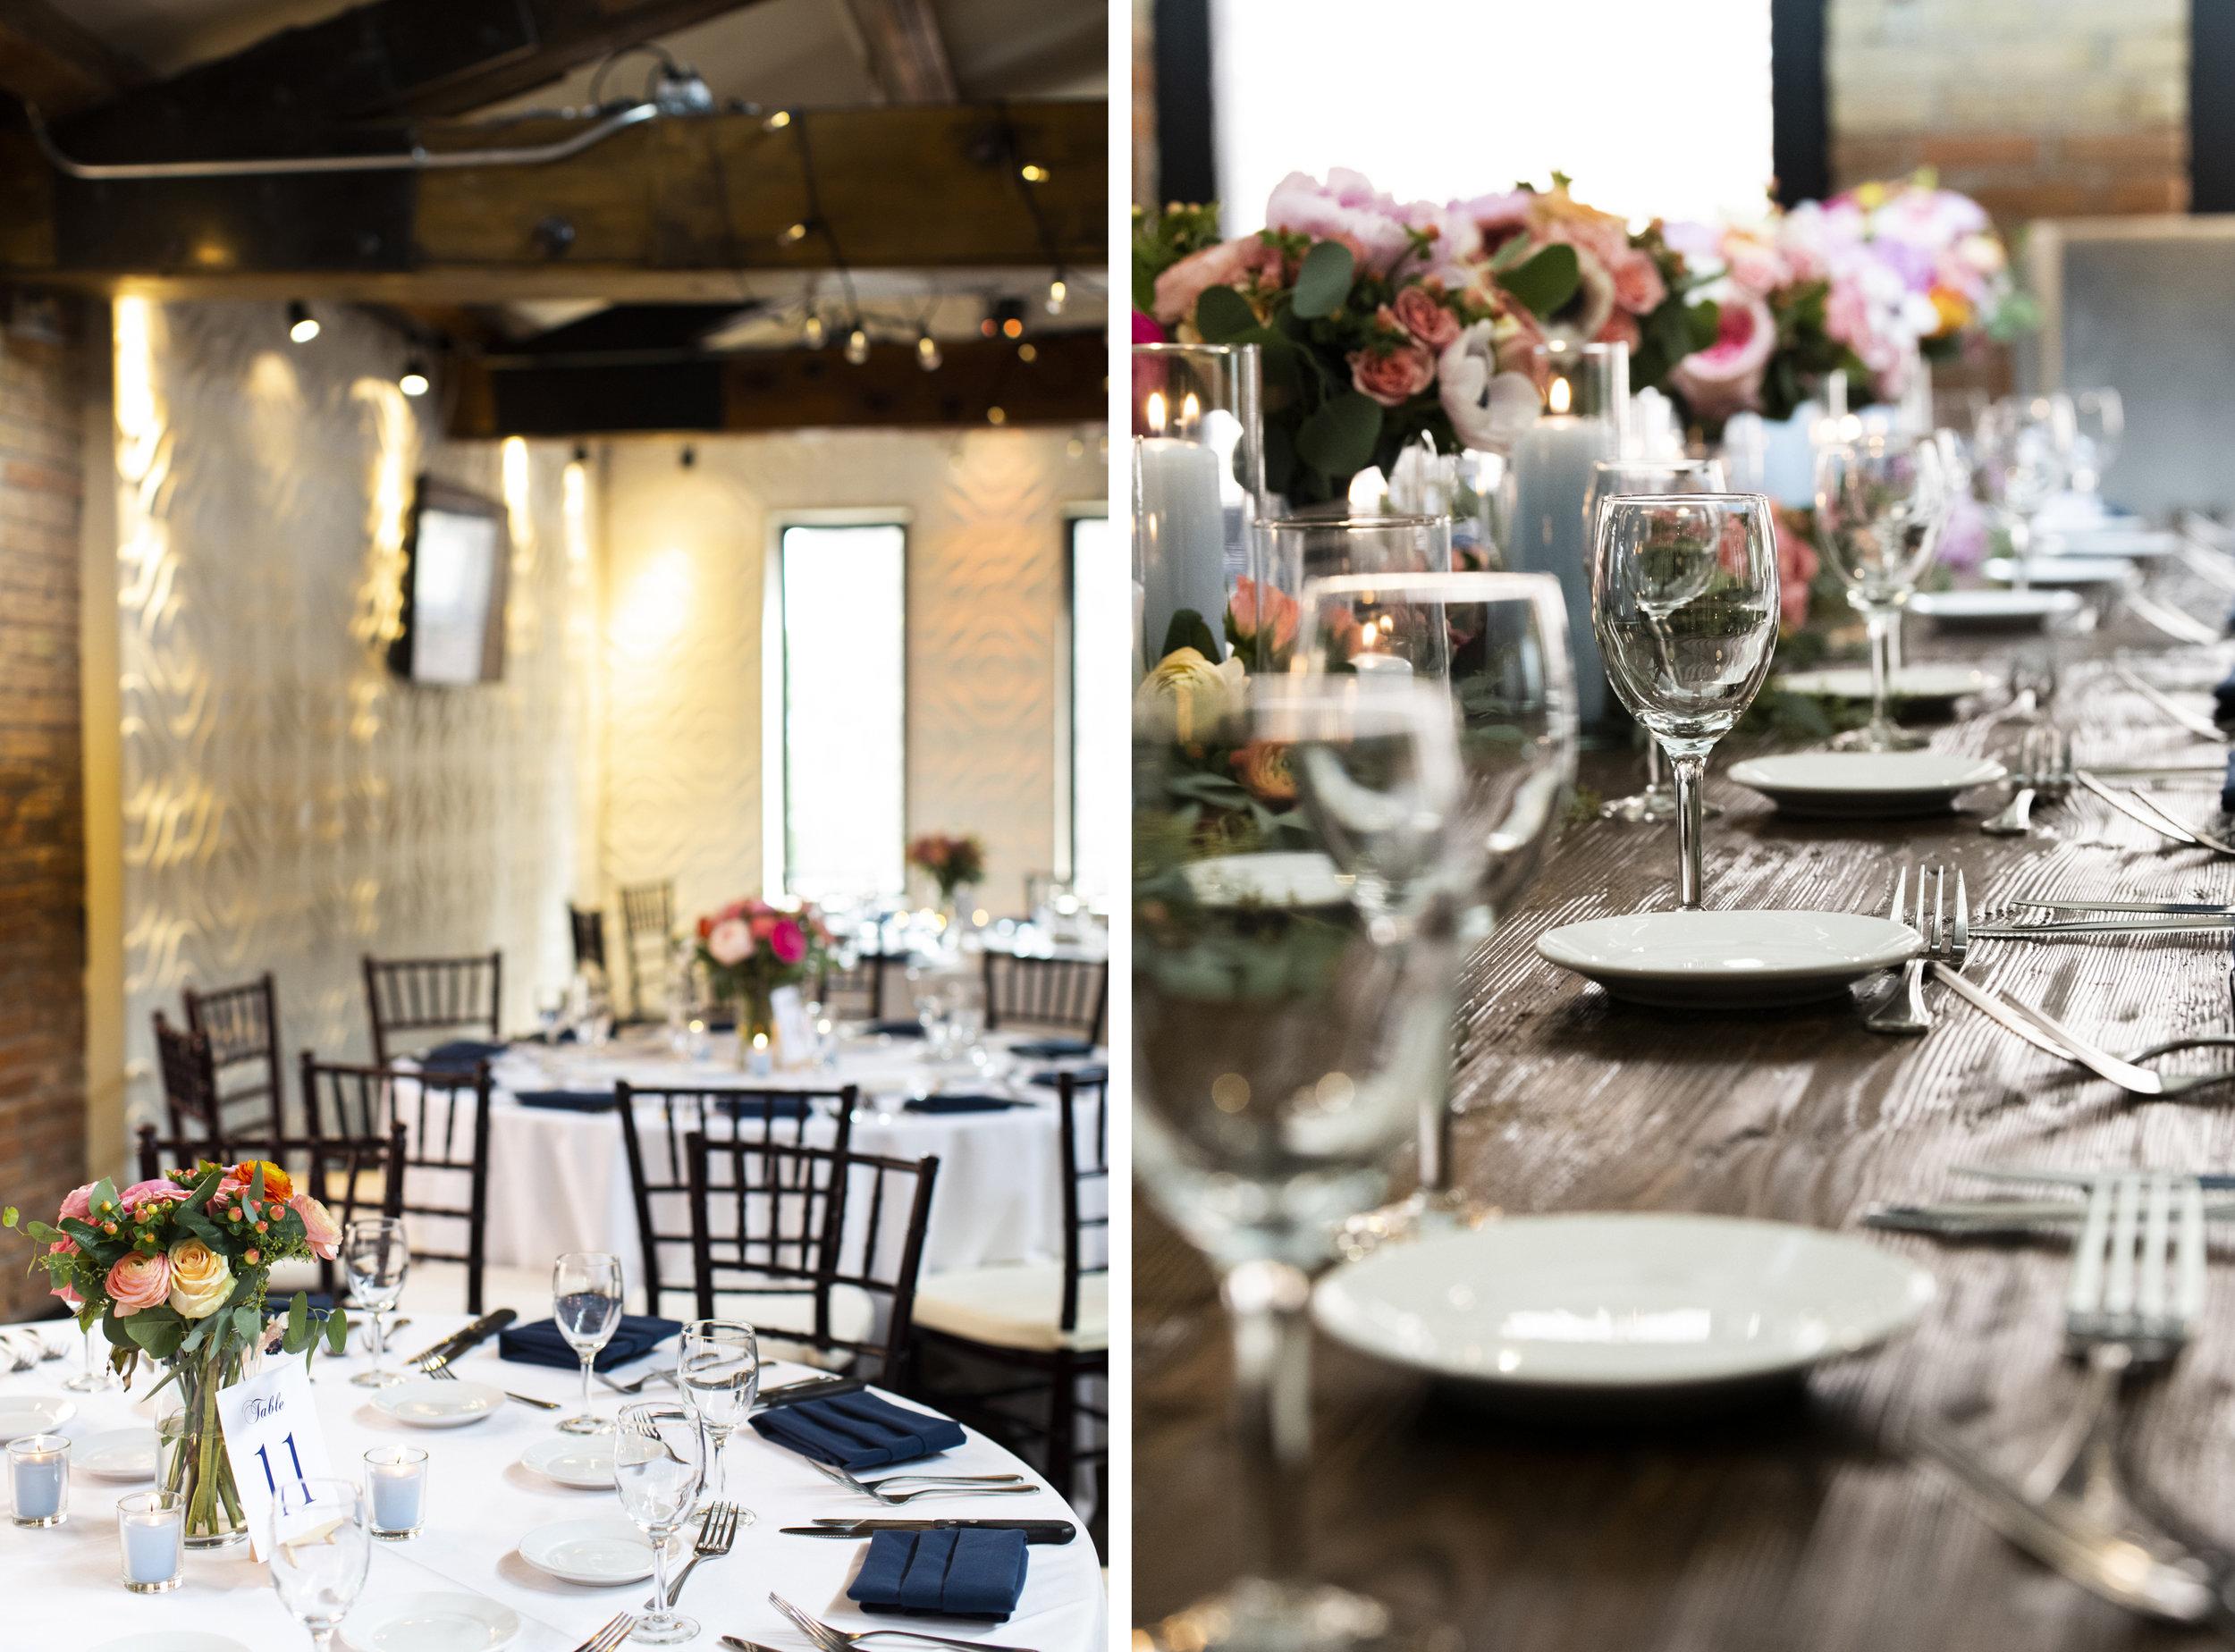 Minneapolis Event Center Wedding MN | Photography by Jess Ekstrand | Rivets & Roses